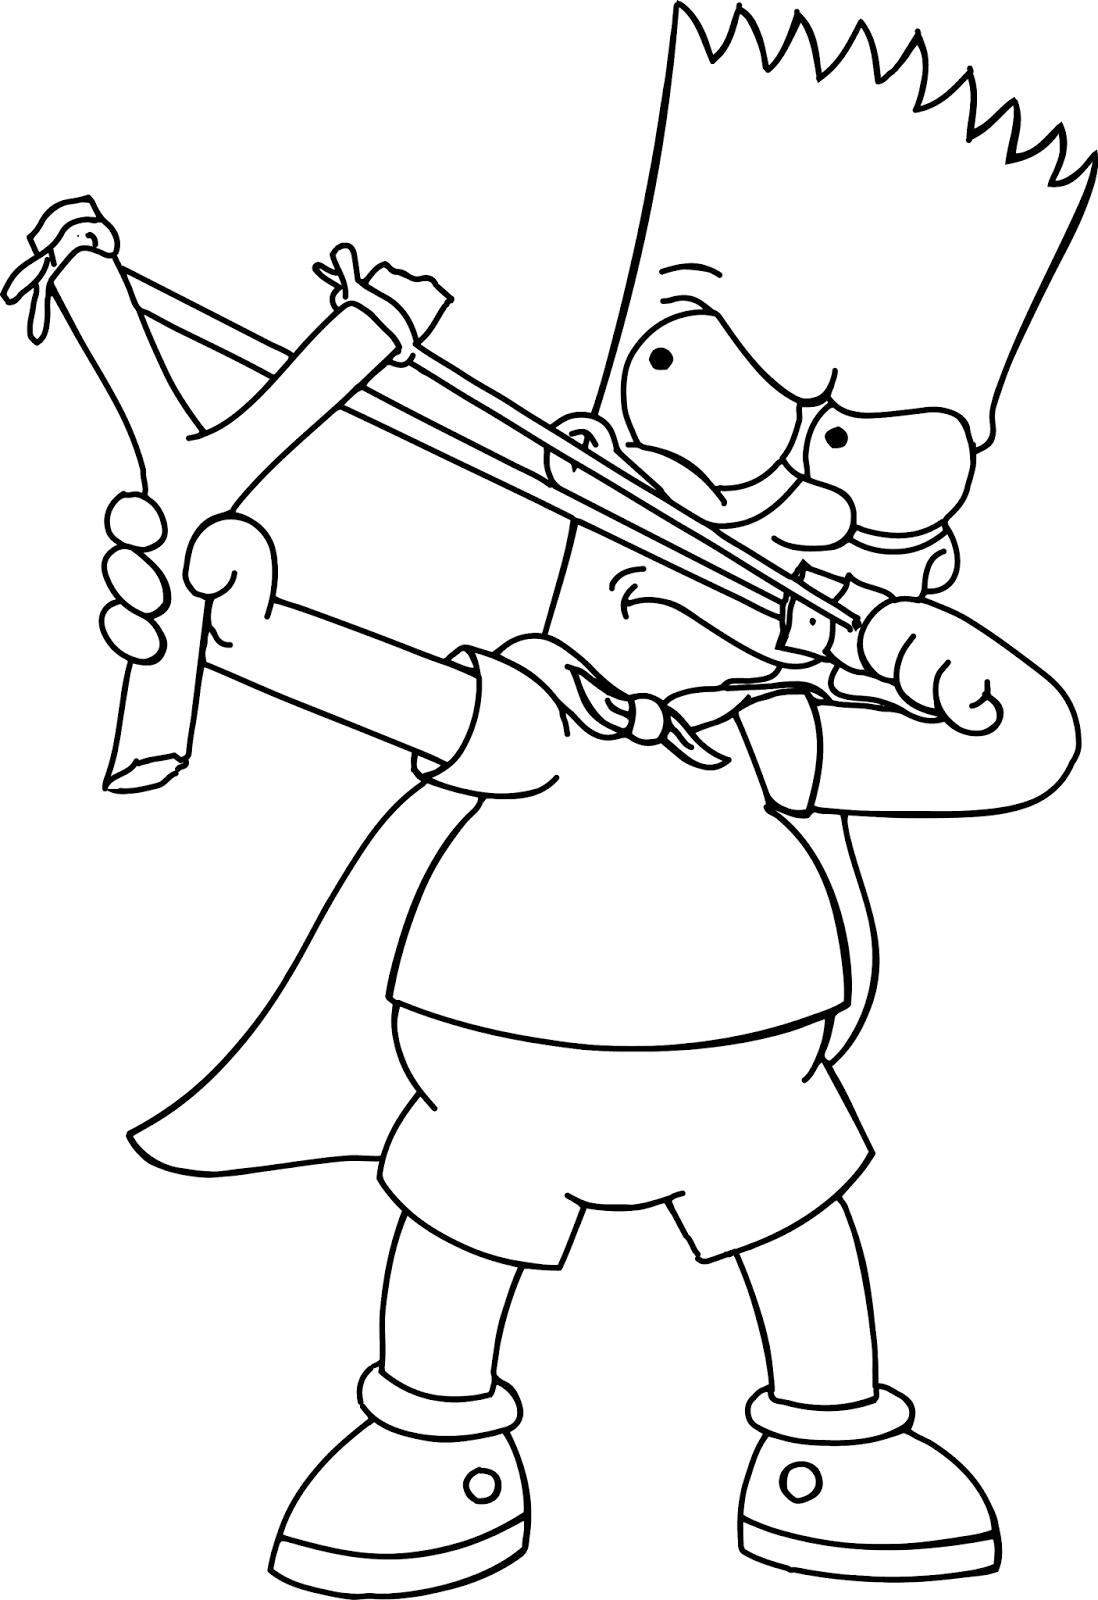 Desenho De Bart Simpson Brincando Com Estilingue Para Colorir